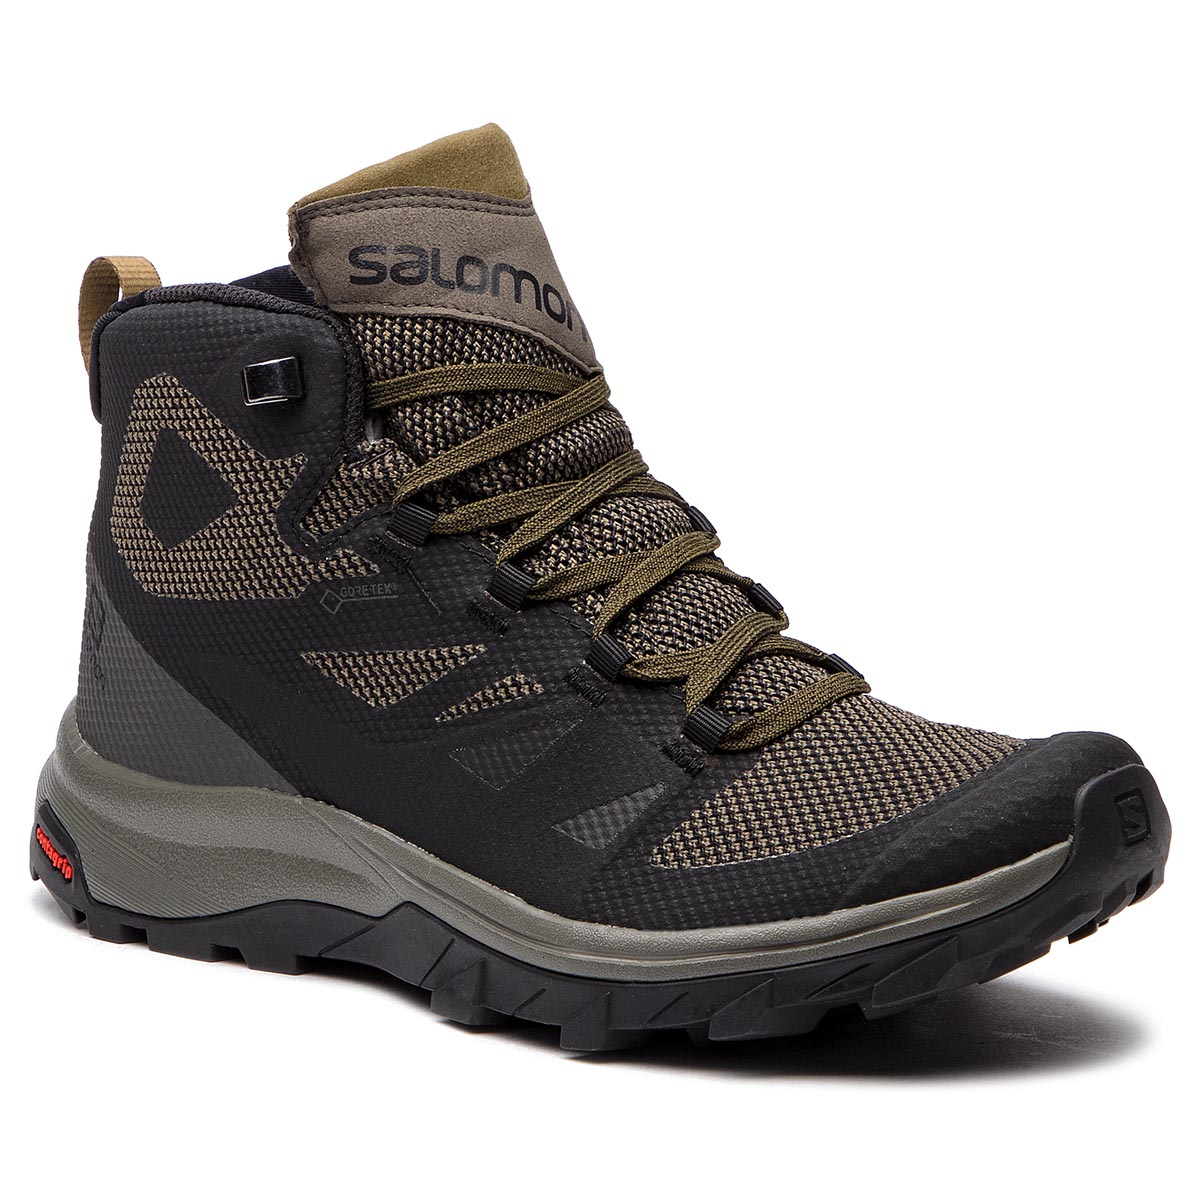 52888e69e4b6 Trekker Boots SALOMON Outline Mid Gtx GORE-TEX 404763 27 V0 Black  Beluga Capers